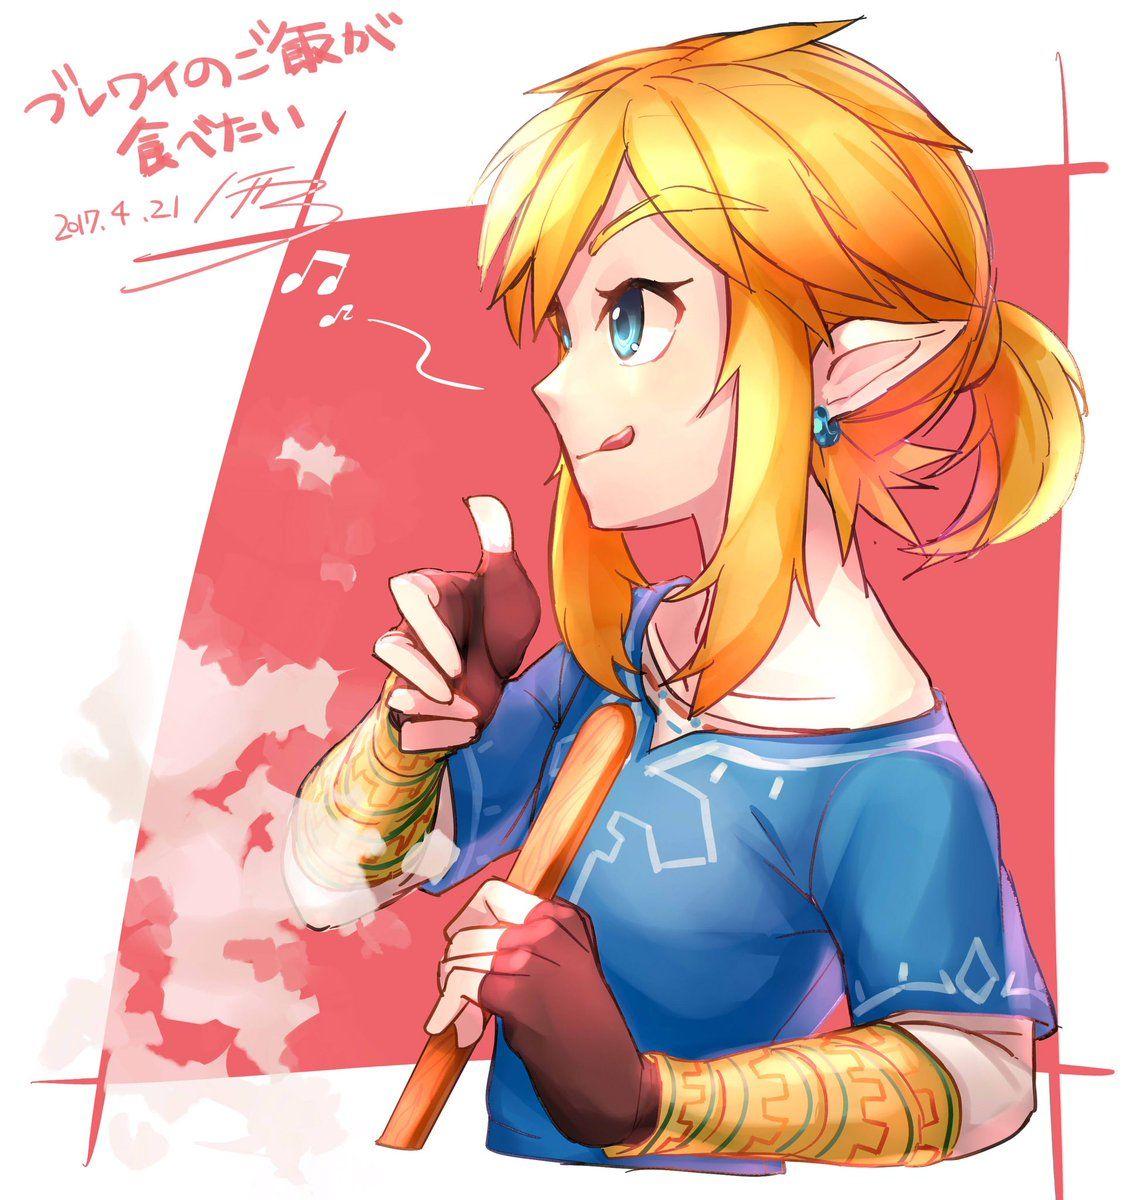 Art by にやま◆ (@niyama_n)